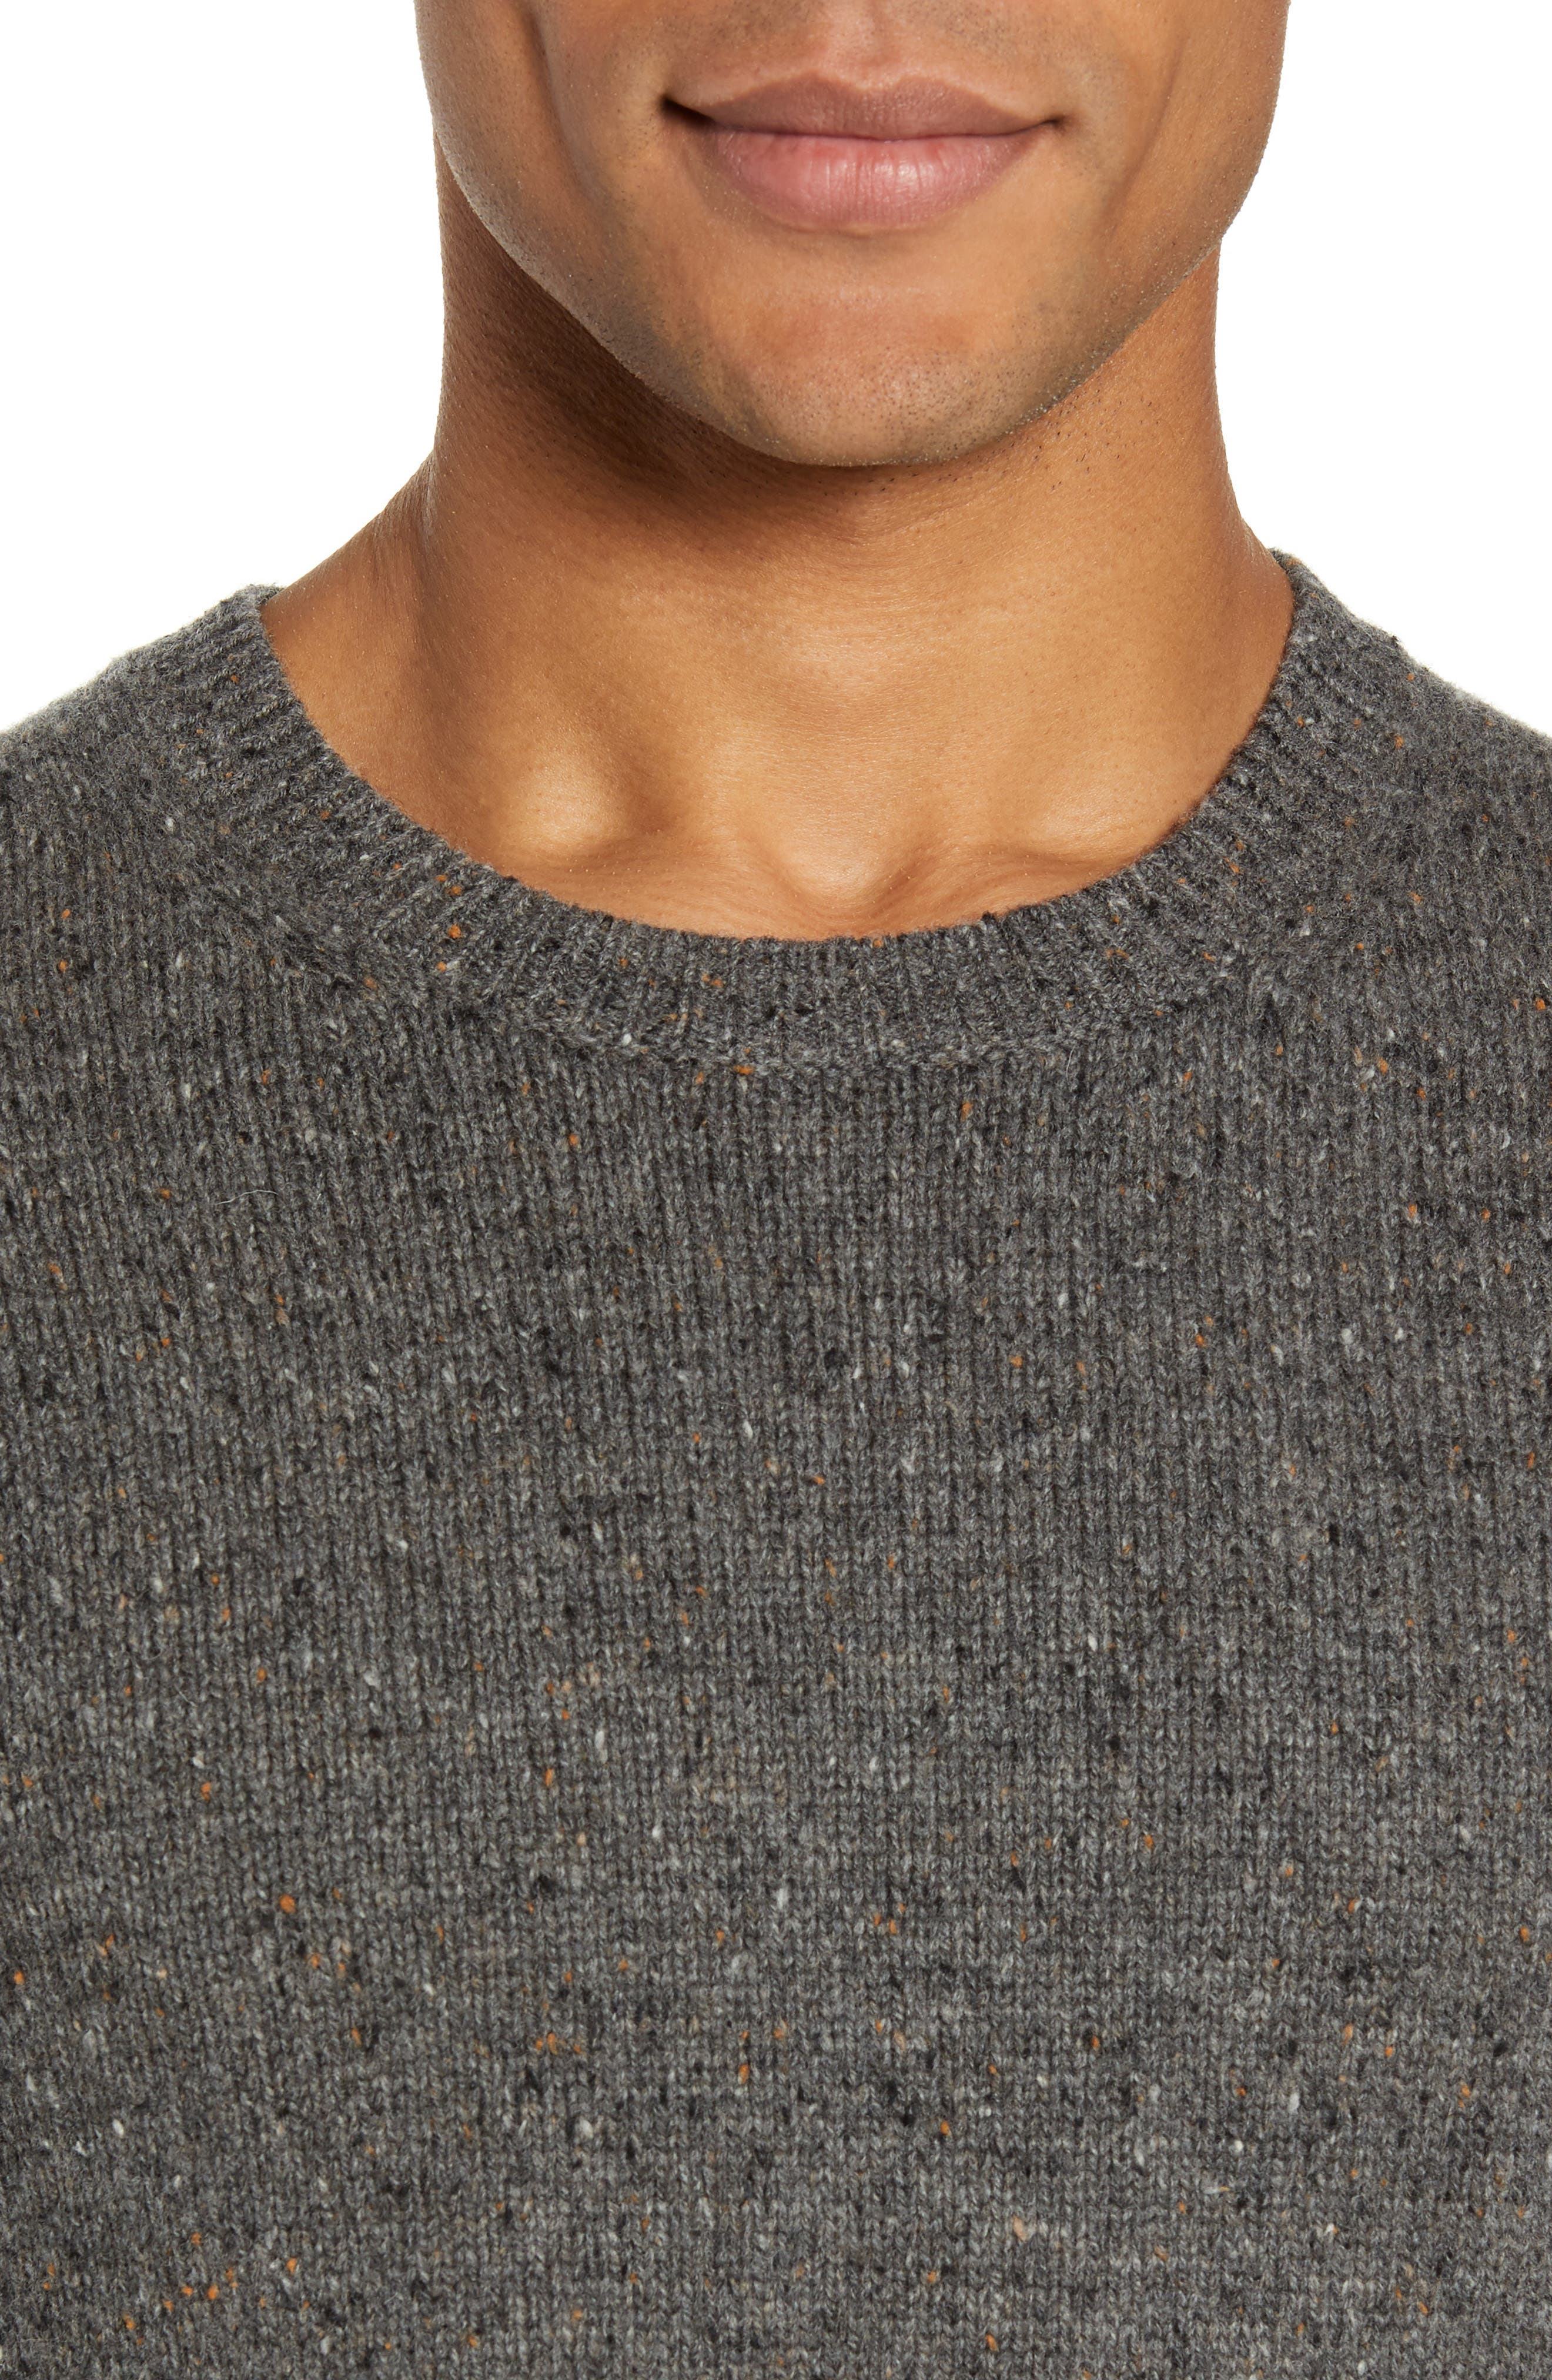 Jaxon Trim Fit Wool Sweater,                             Alternate thumbnail 4, color,                             GREY MULTI